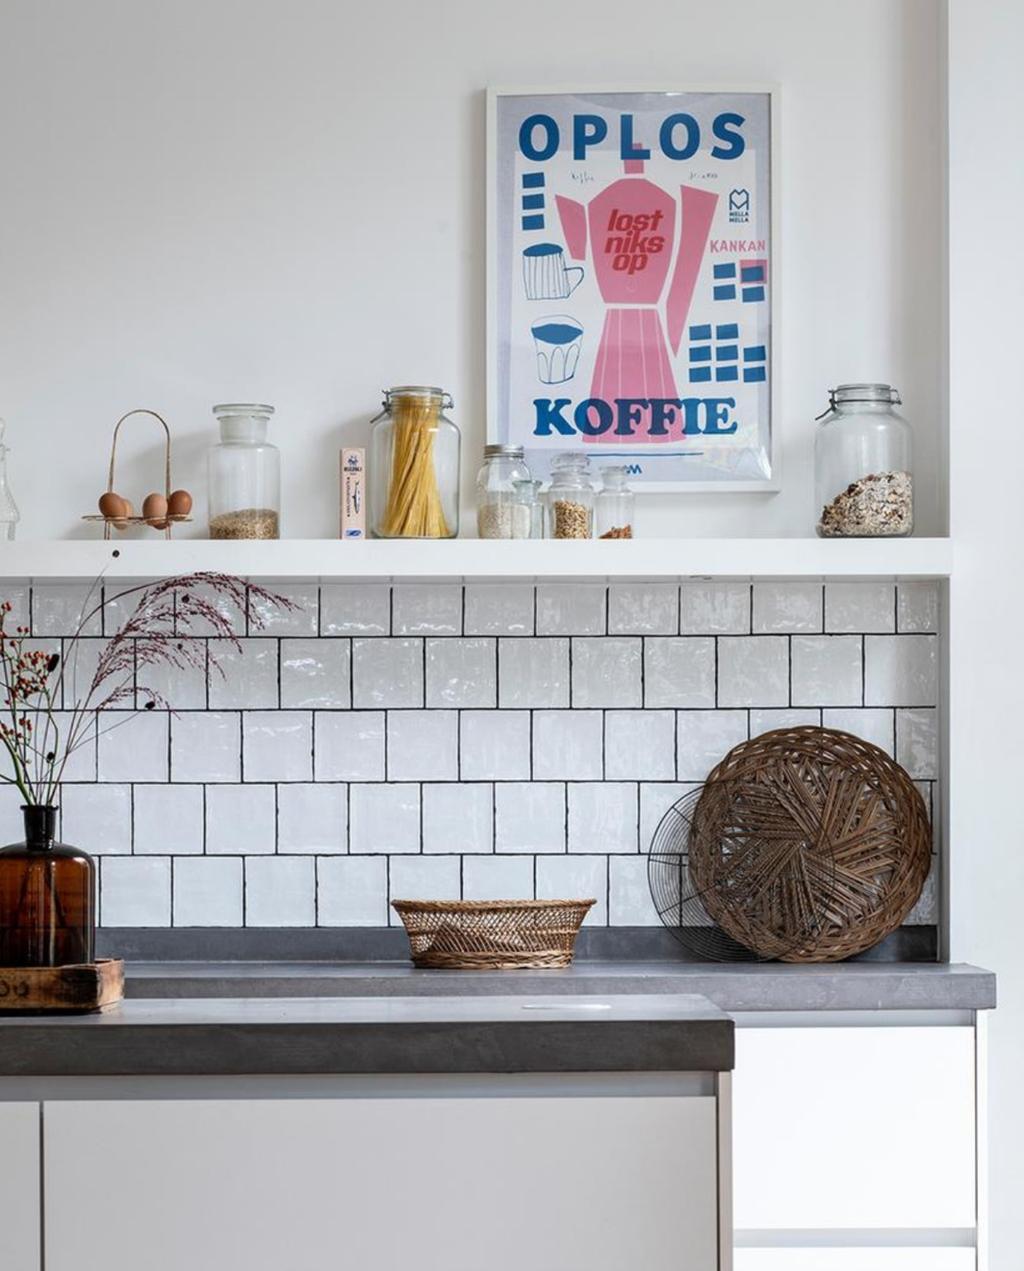 keuken   vtwonen   meer kleur   tegels   print   poster   koffie